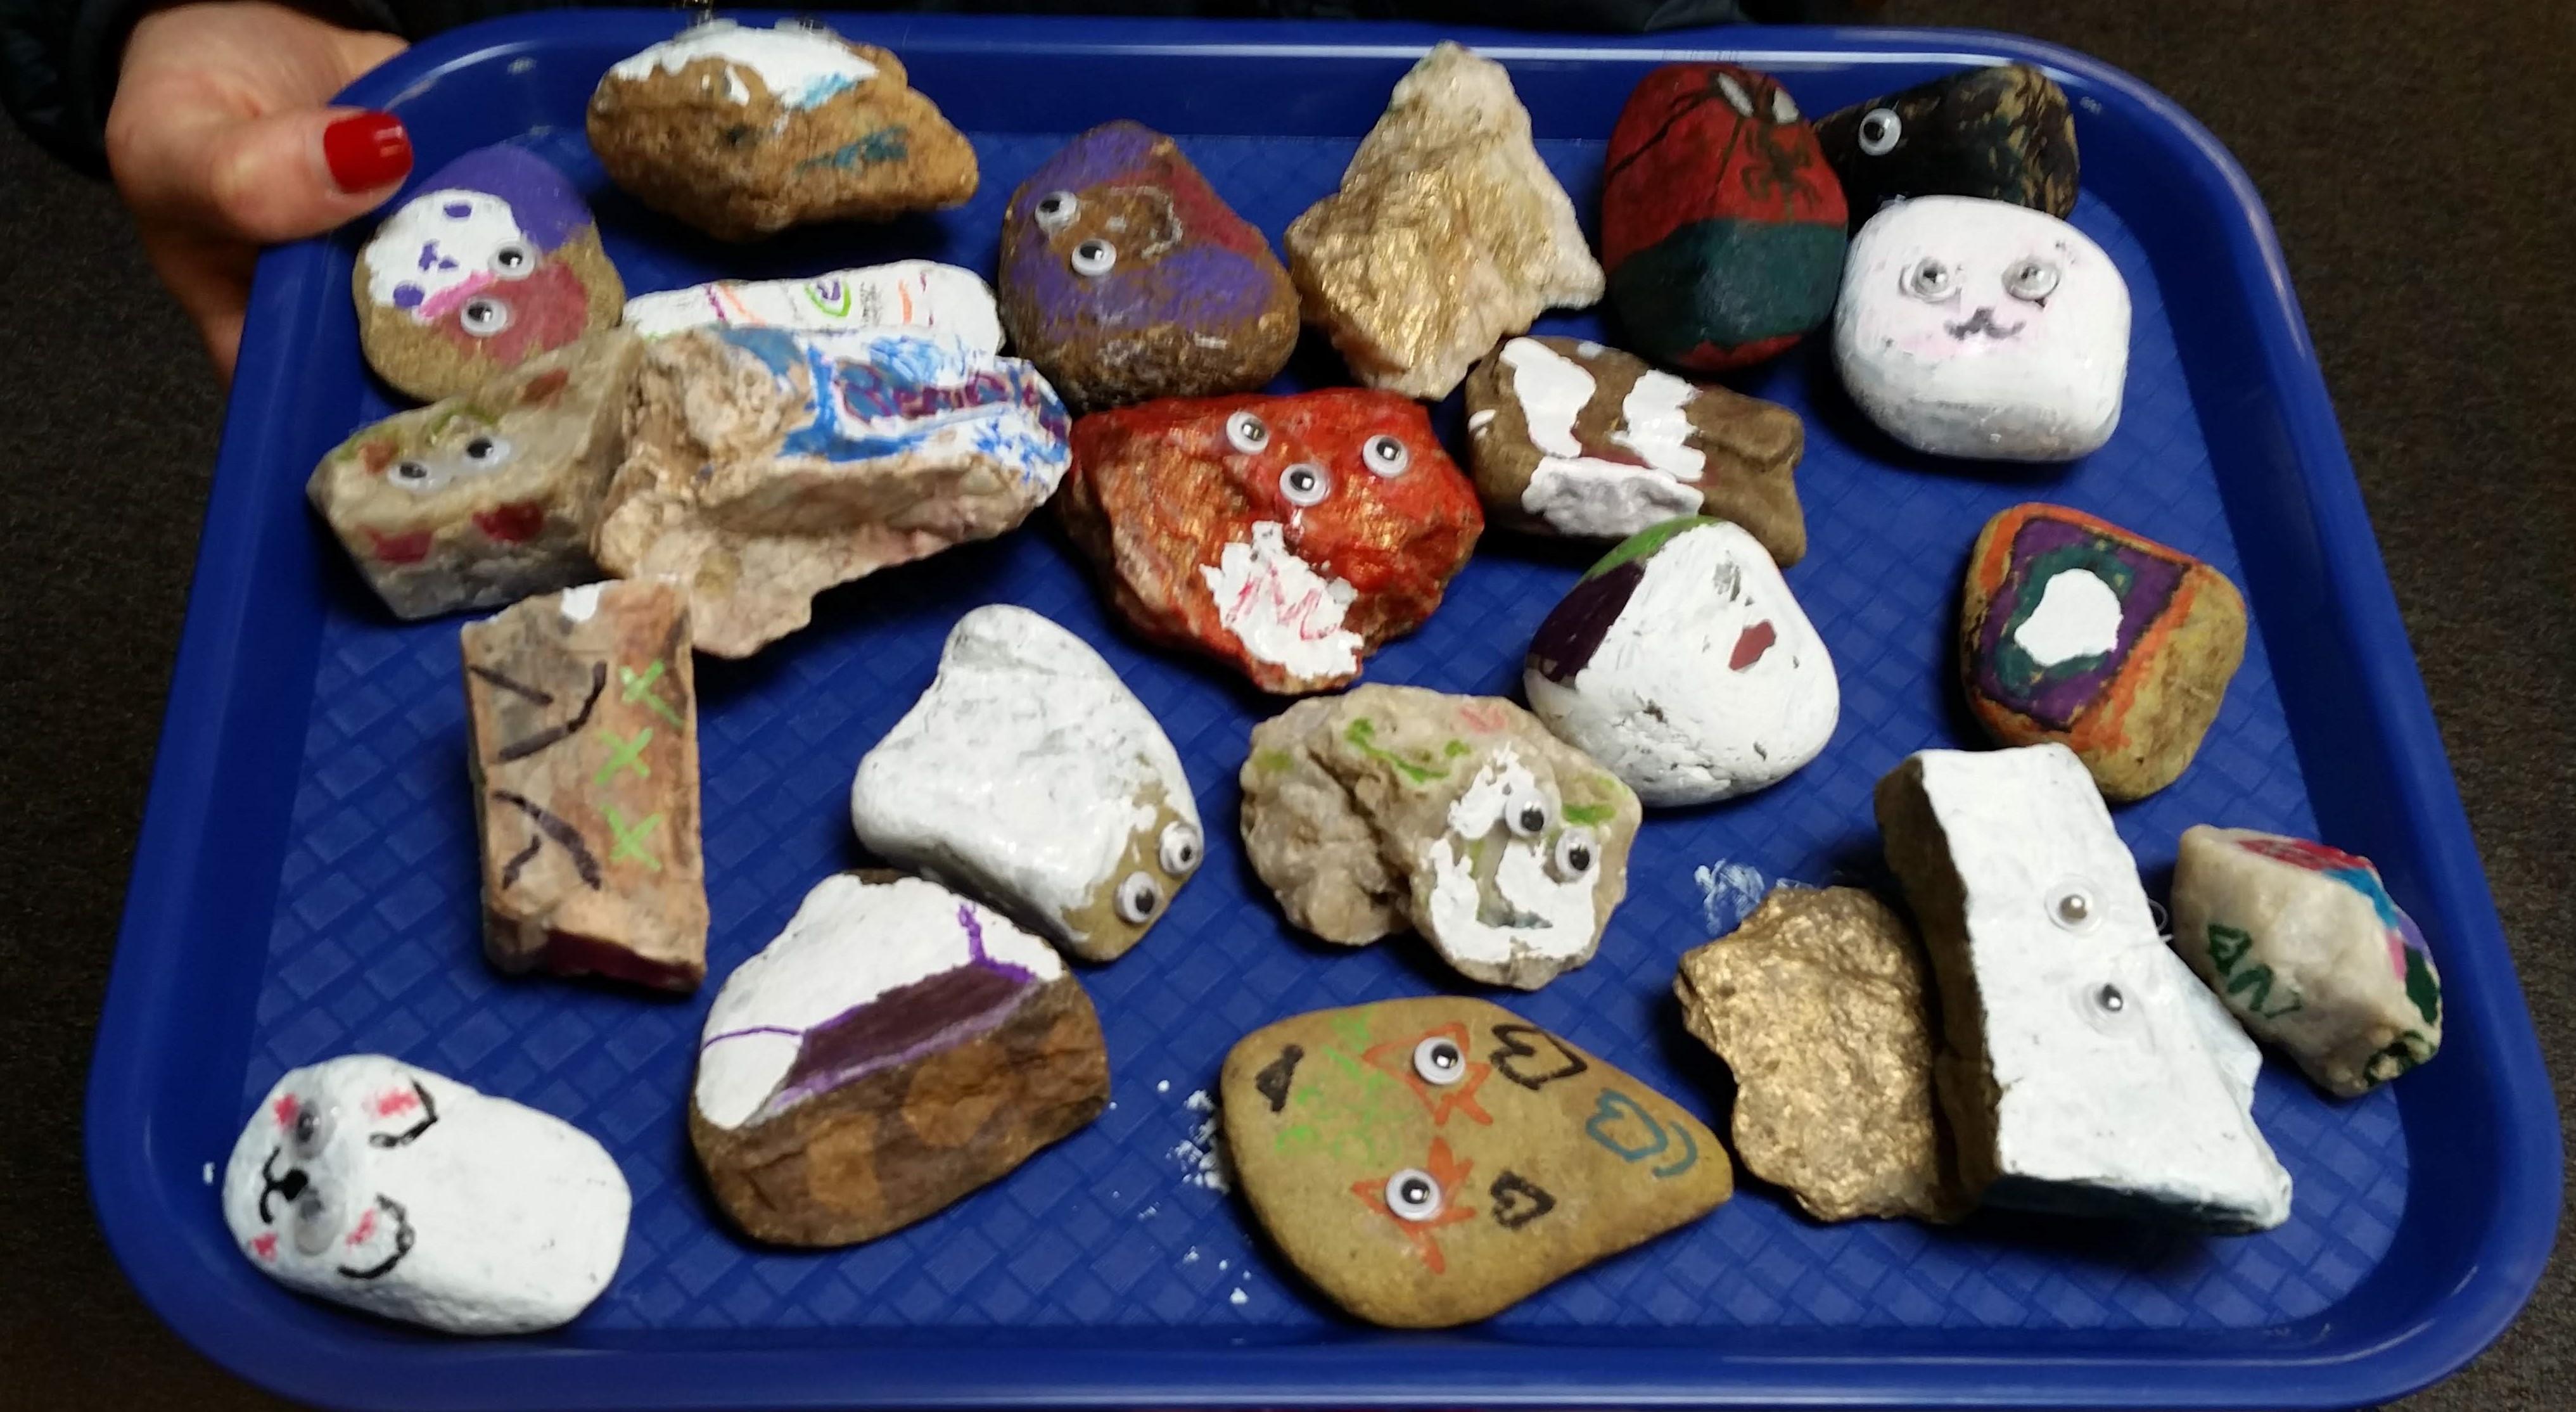 Images of pet rocks